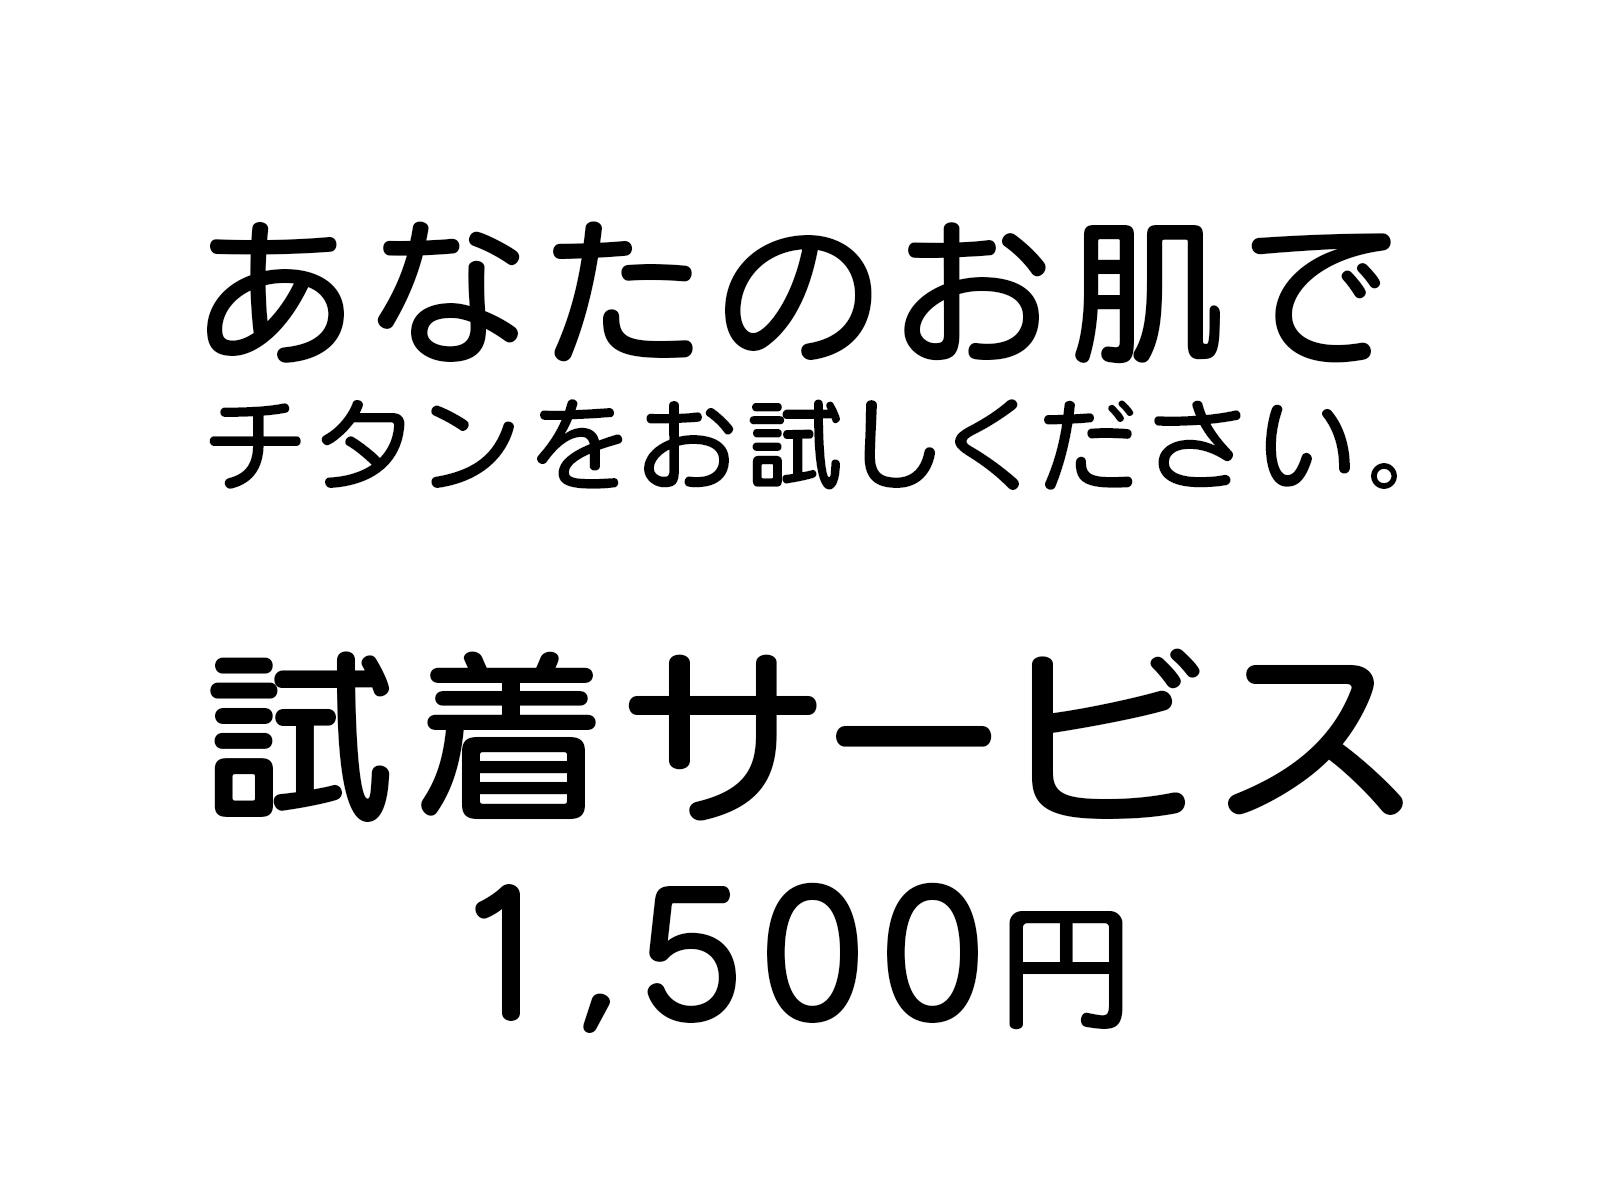 ZZ-00001